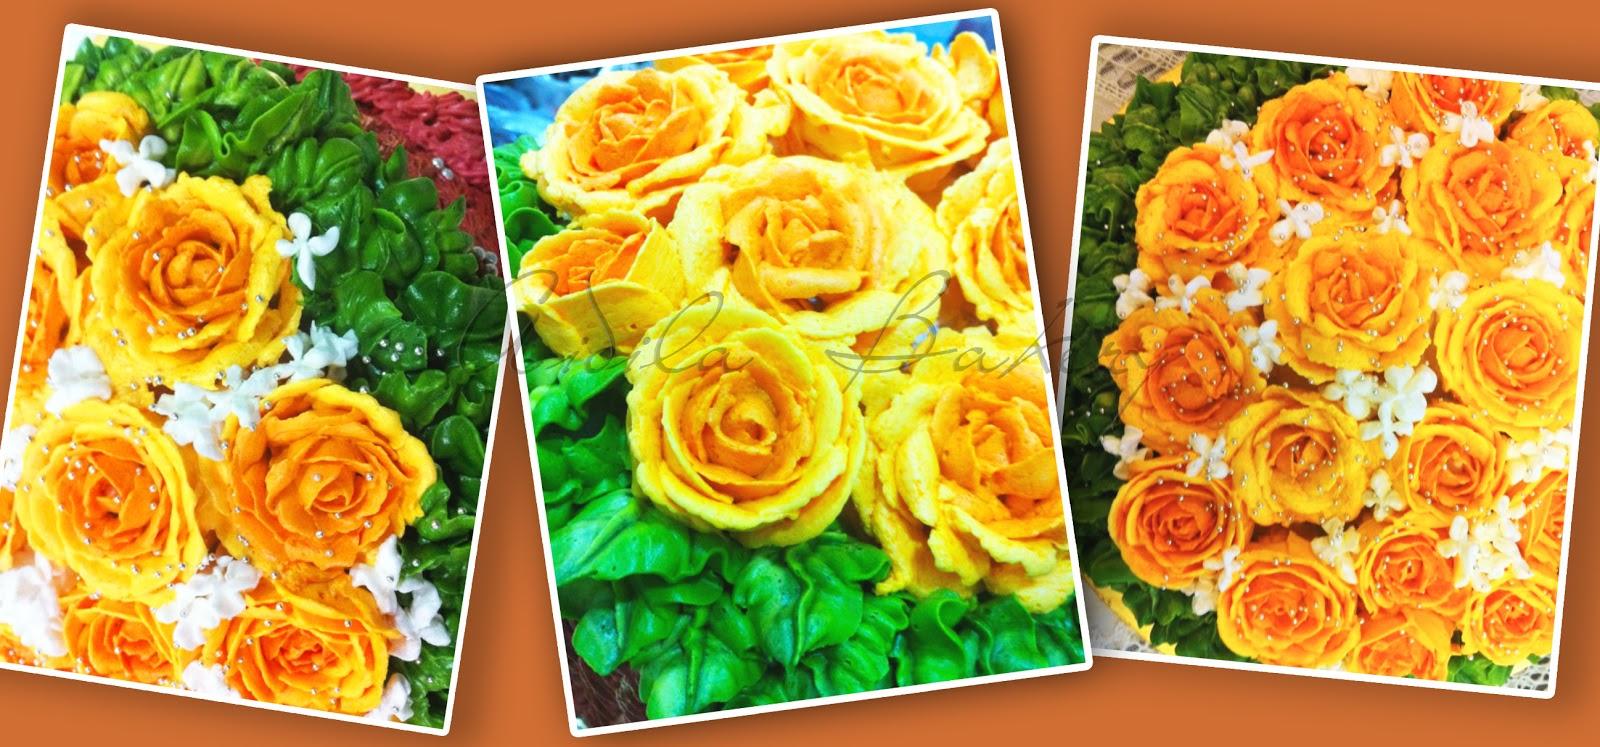 aidilabakery hiasan bunga